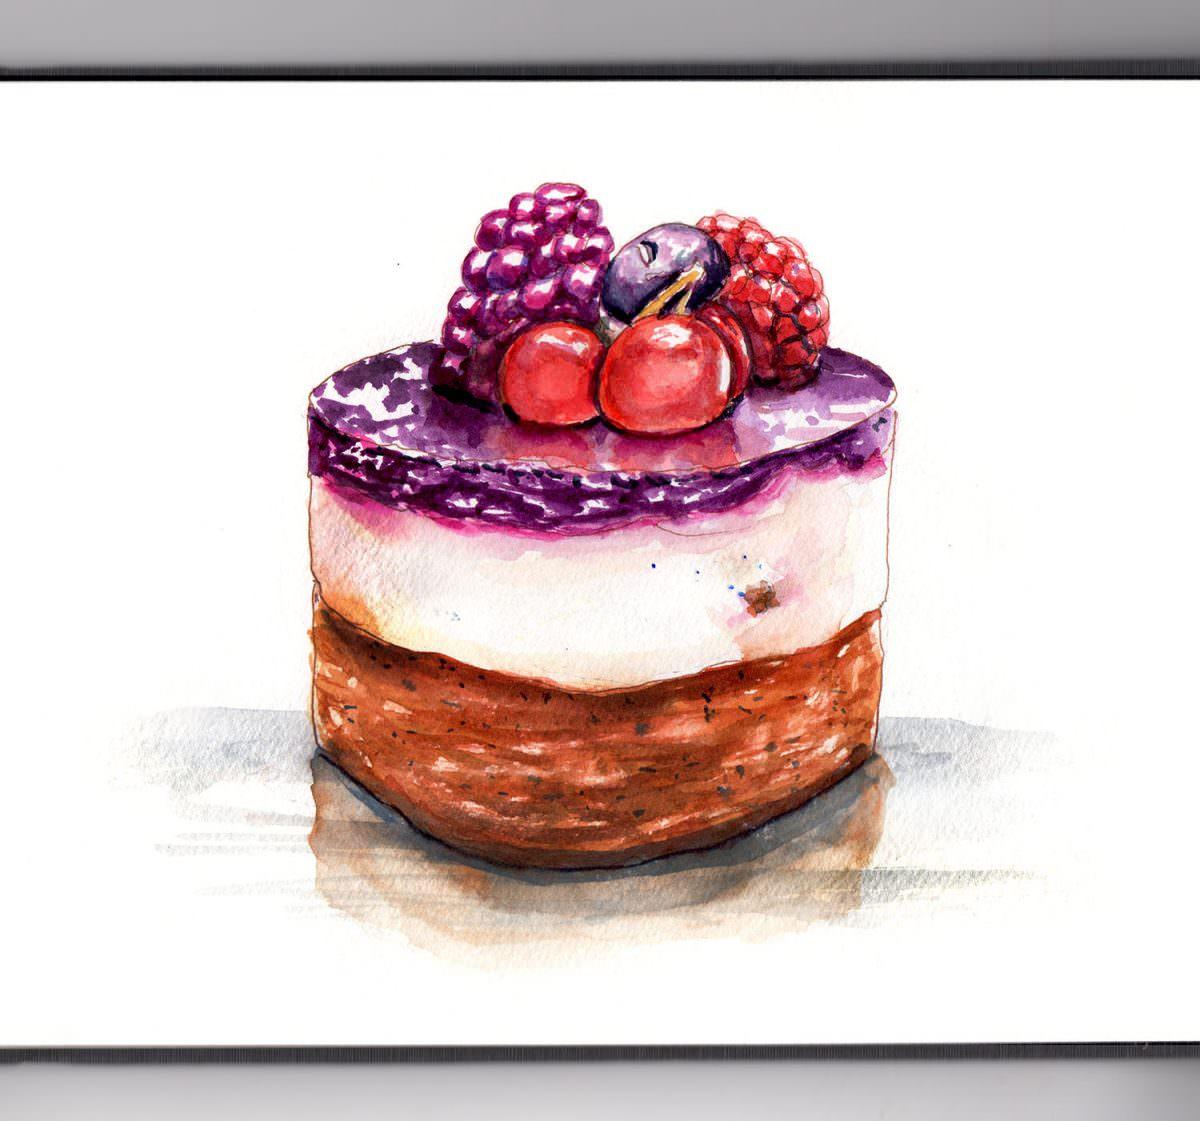 #WorldWatercolorGroup - Day 13 - Dessert Break - French Pastry - Doodlewash